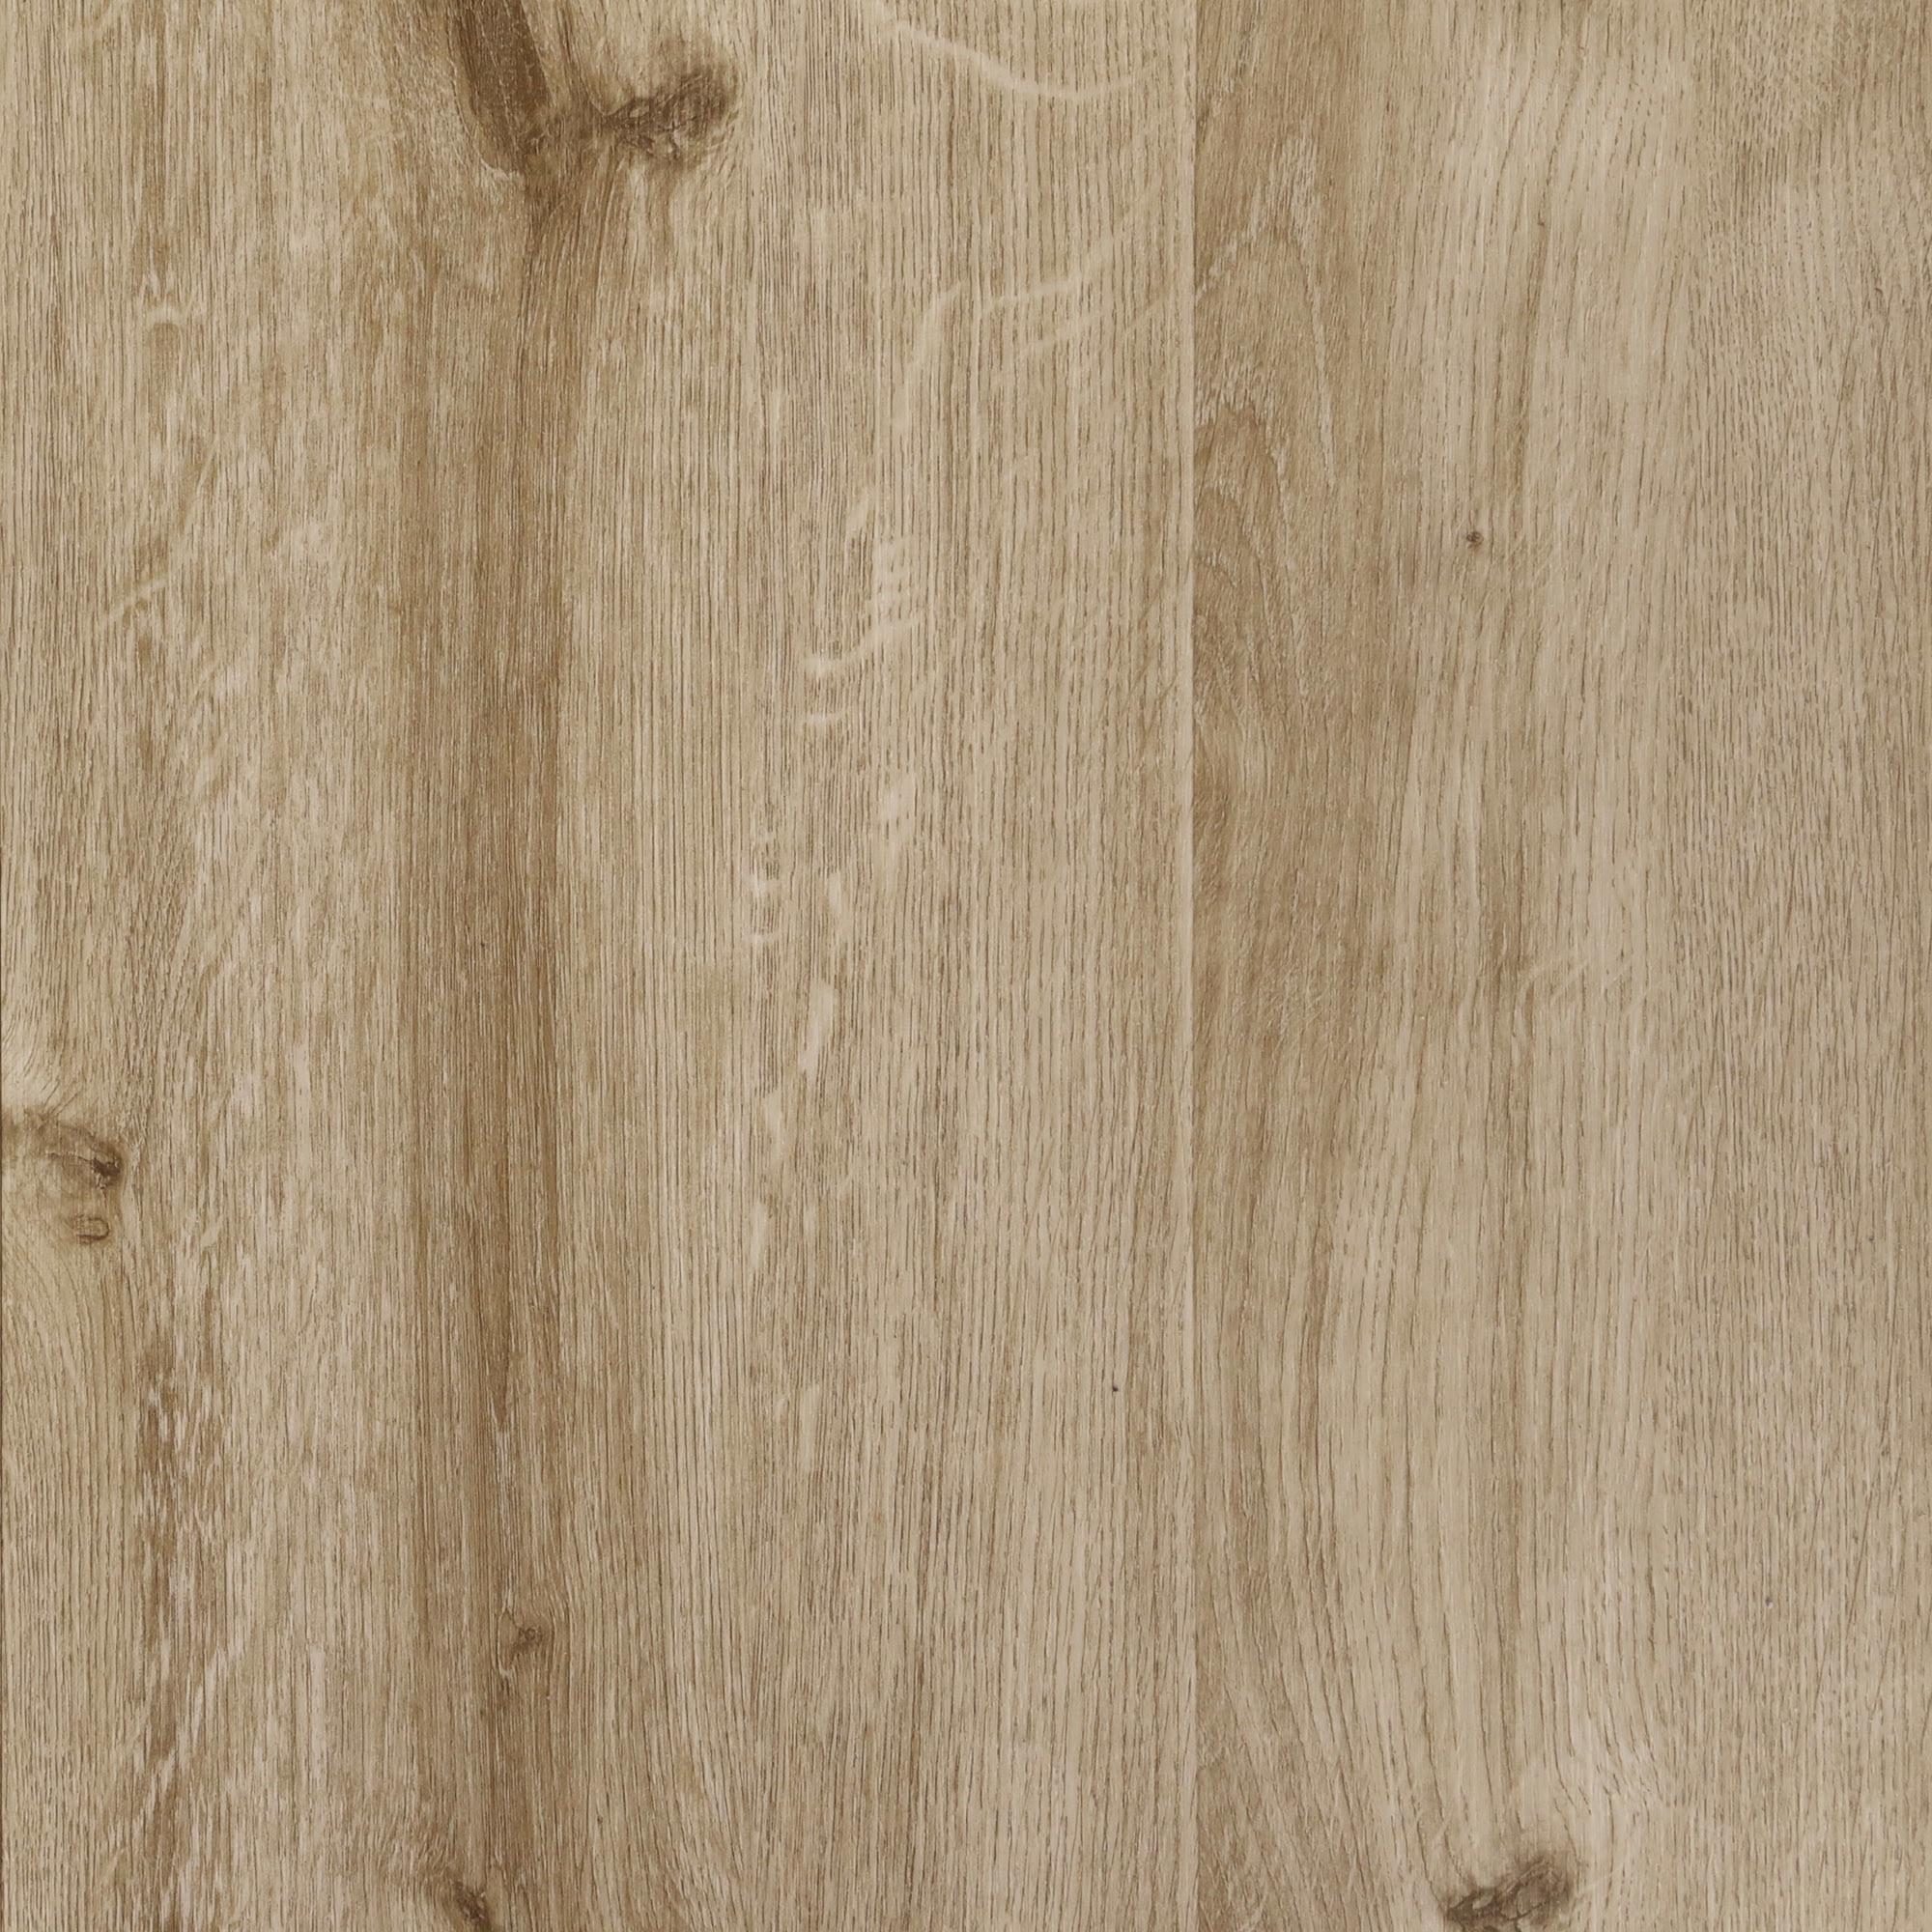 Vesdura Vinyl Planks 6mm Wpc Click Lock Long Plank